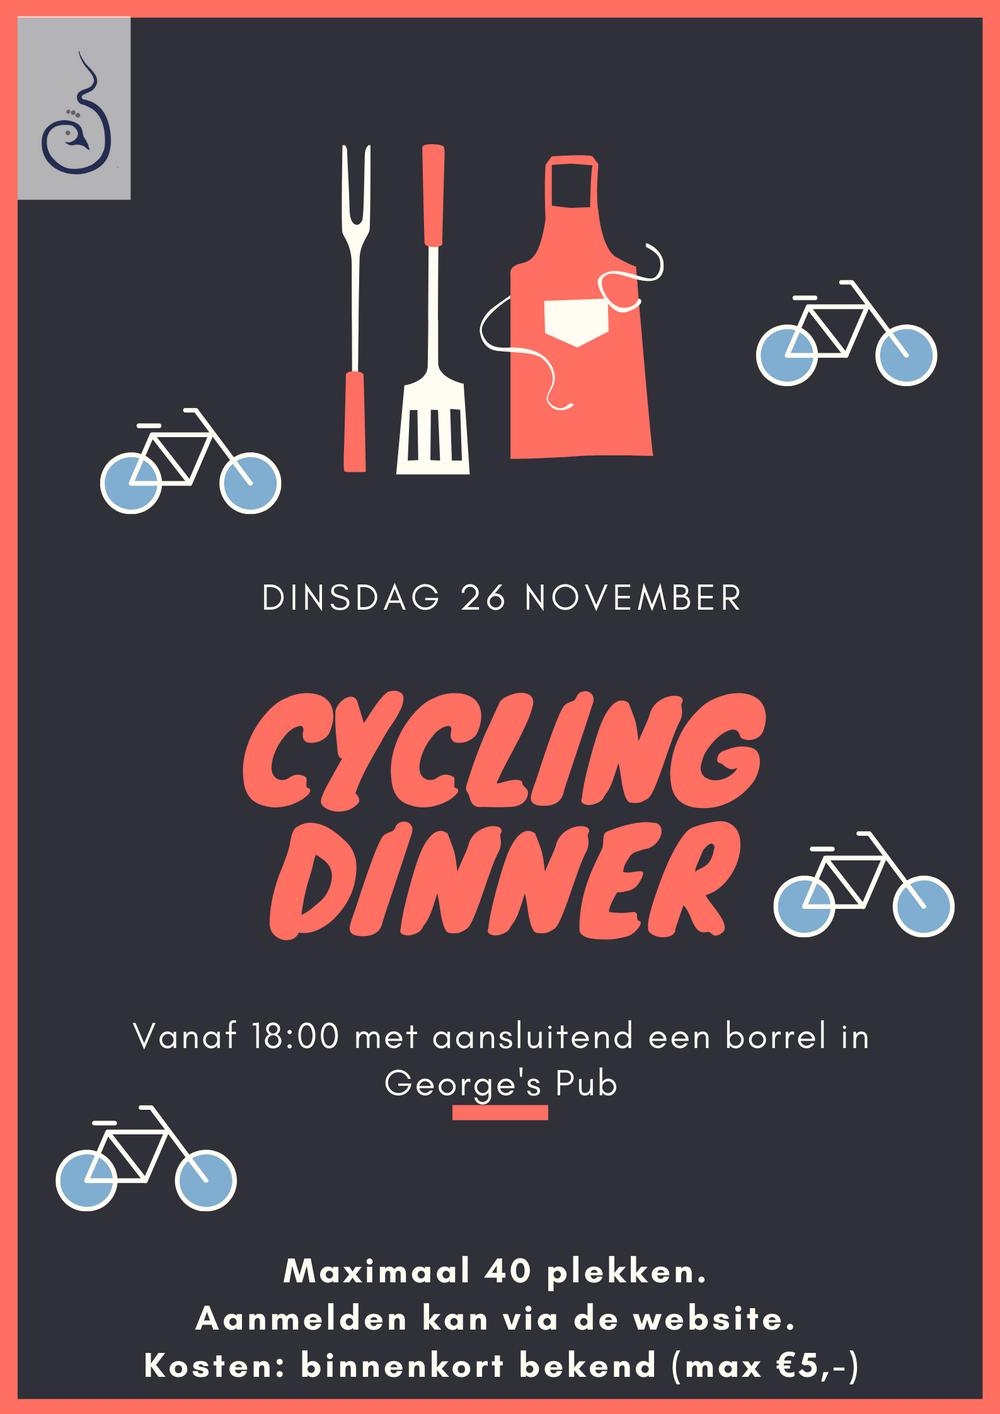 Cycling dinner